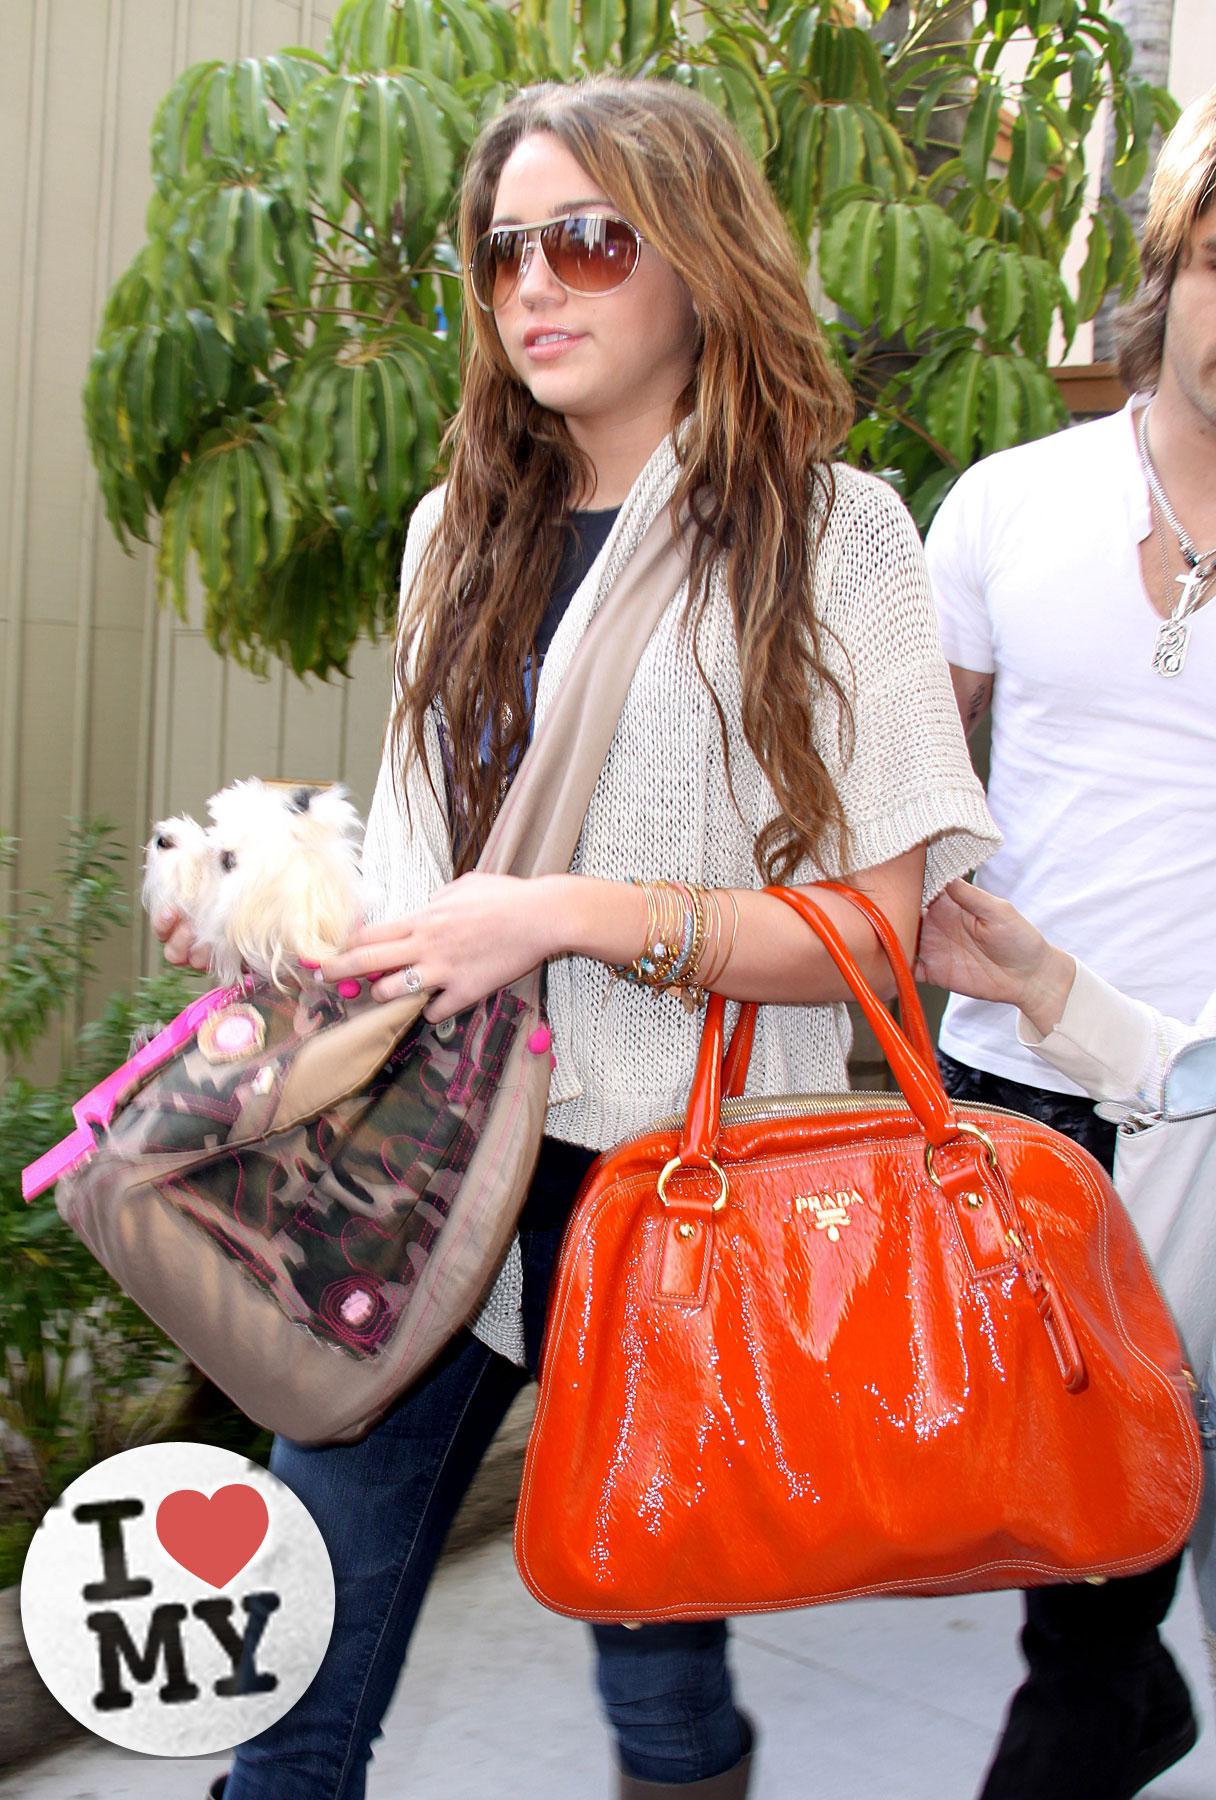 Miley Cyrus: I Love My…Orange Prada Bag